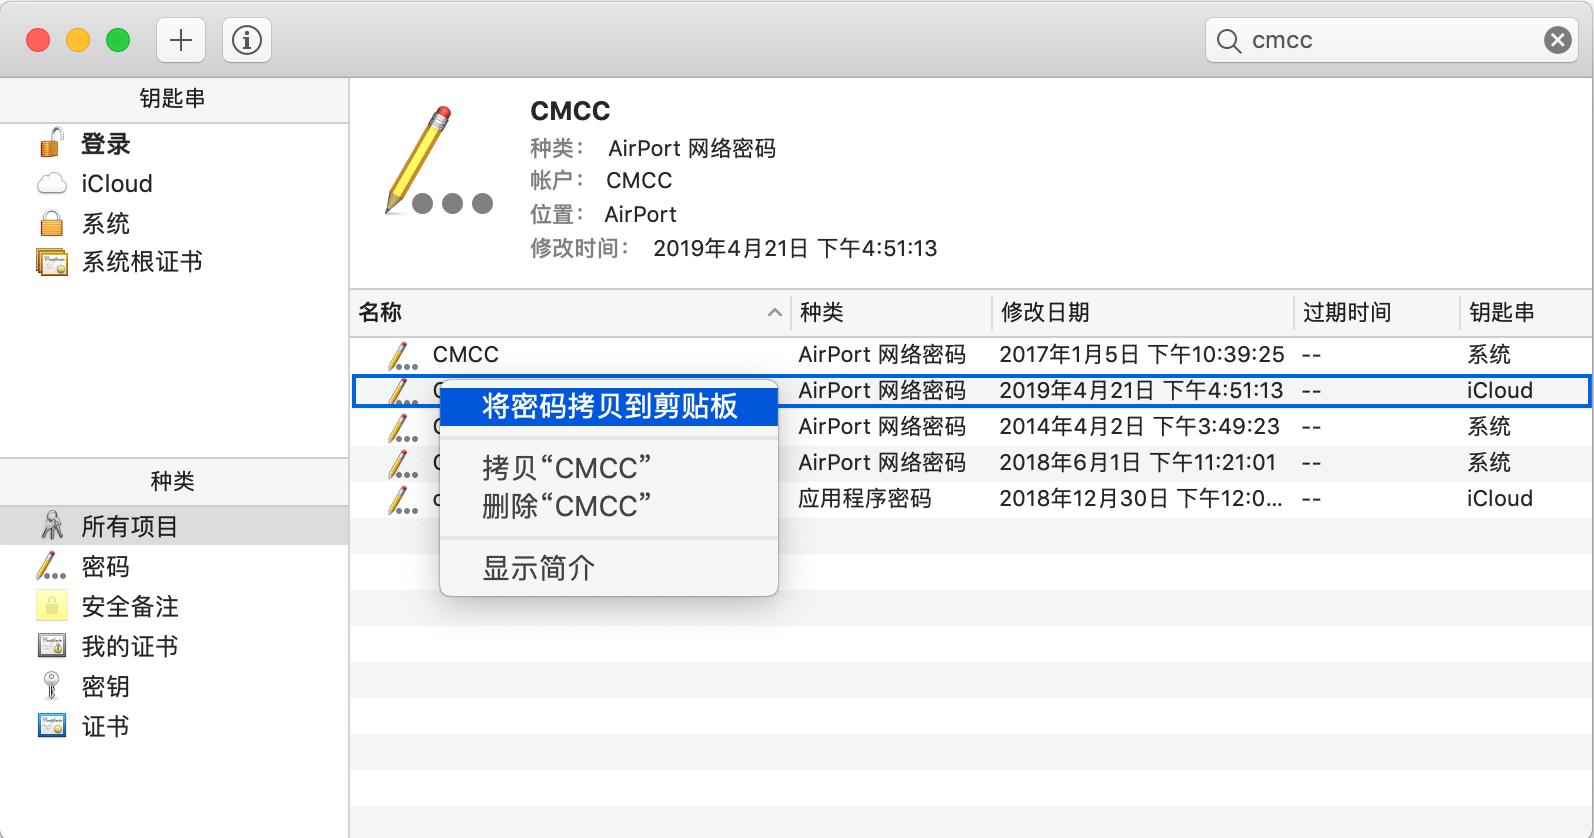 macOS使用小技巧,通过keychain查询密码